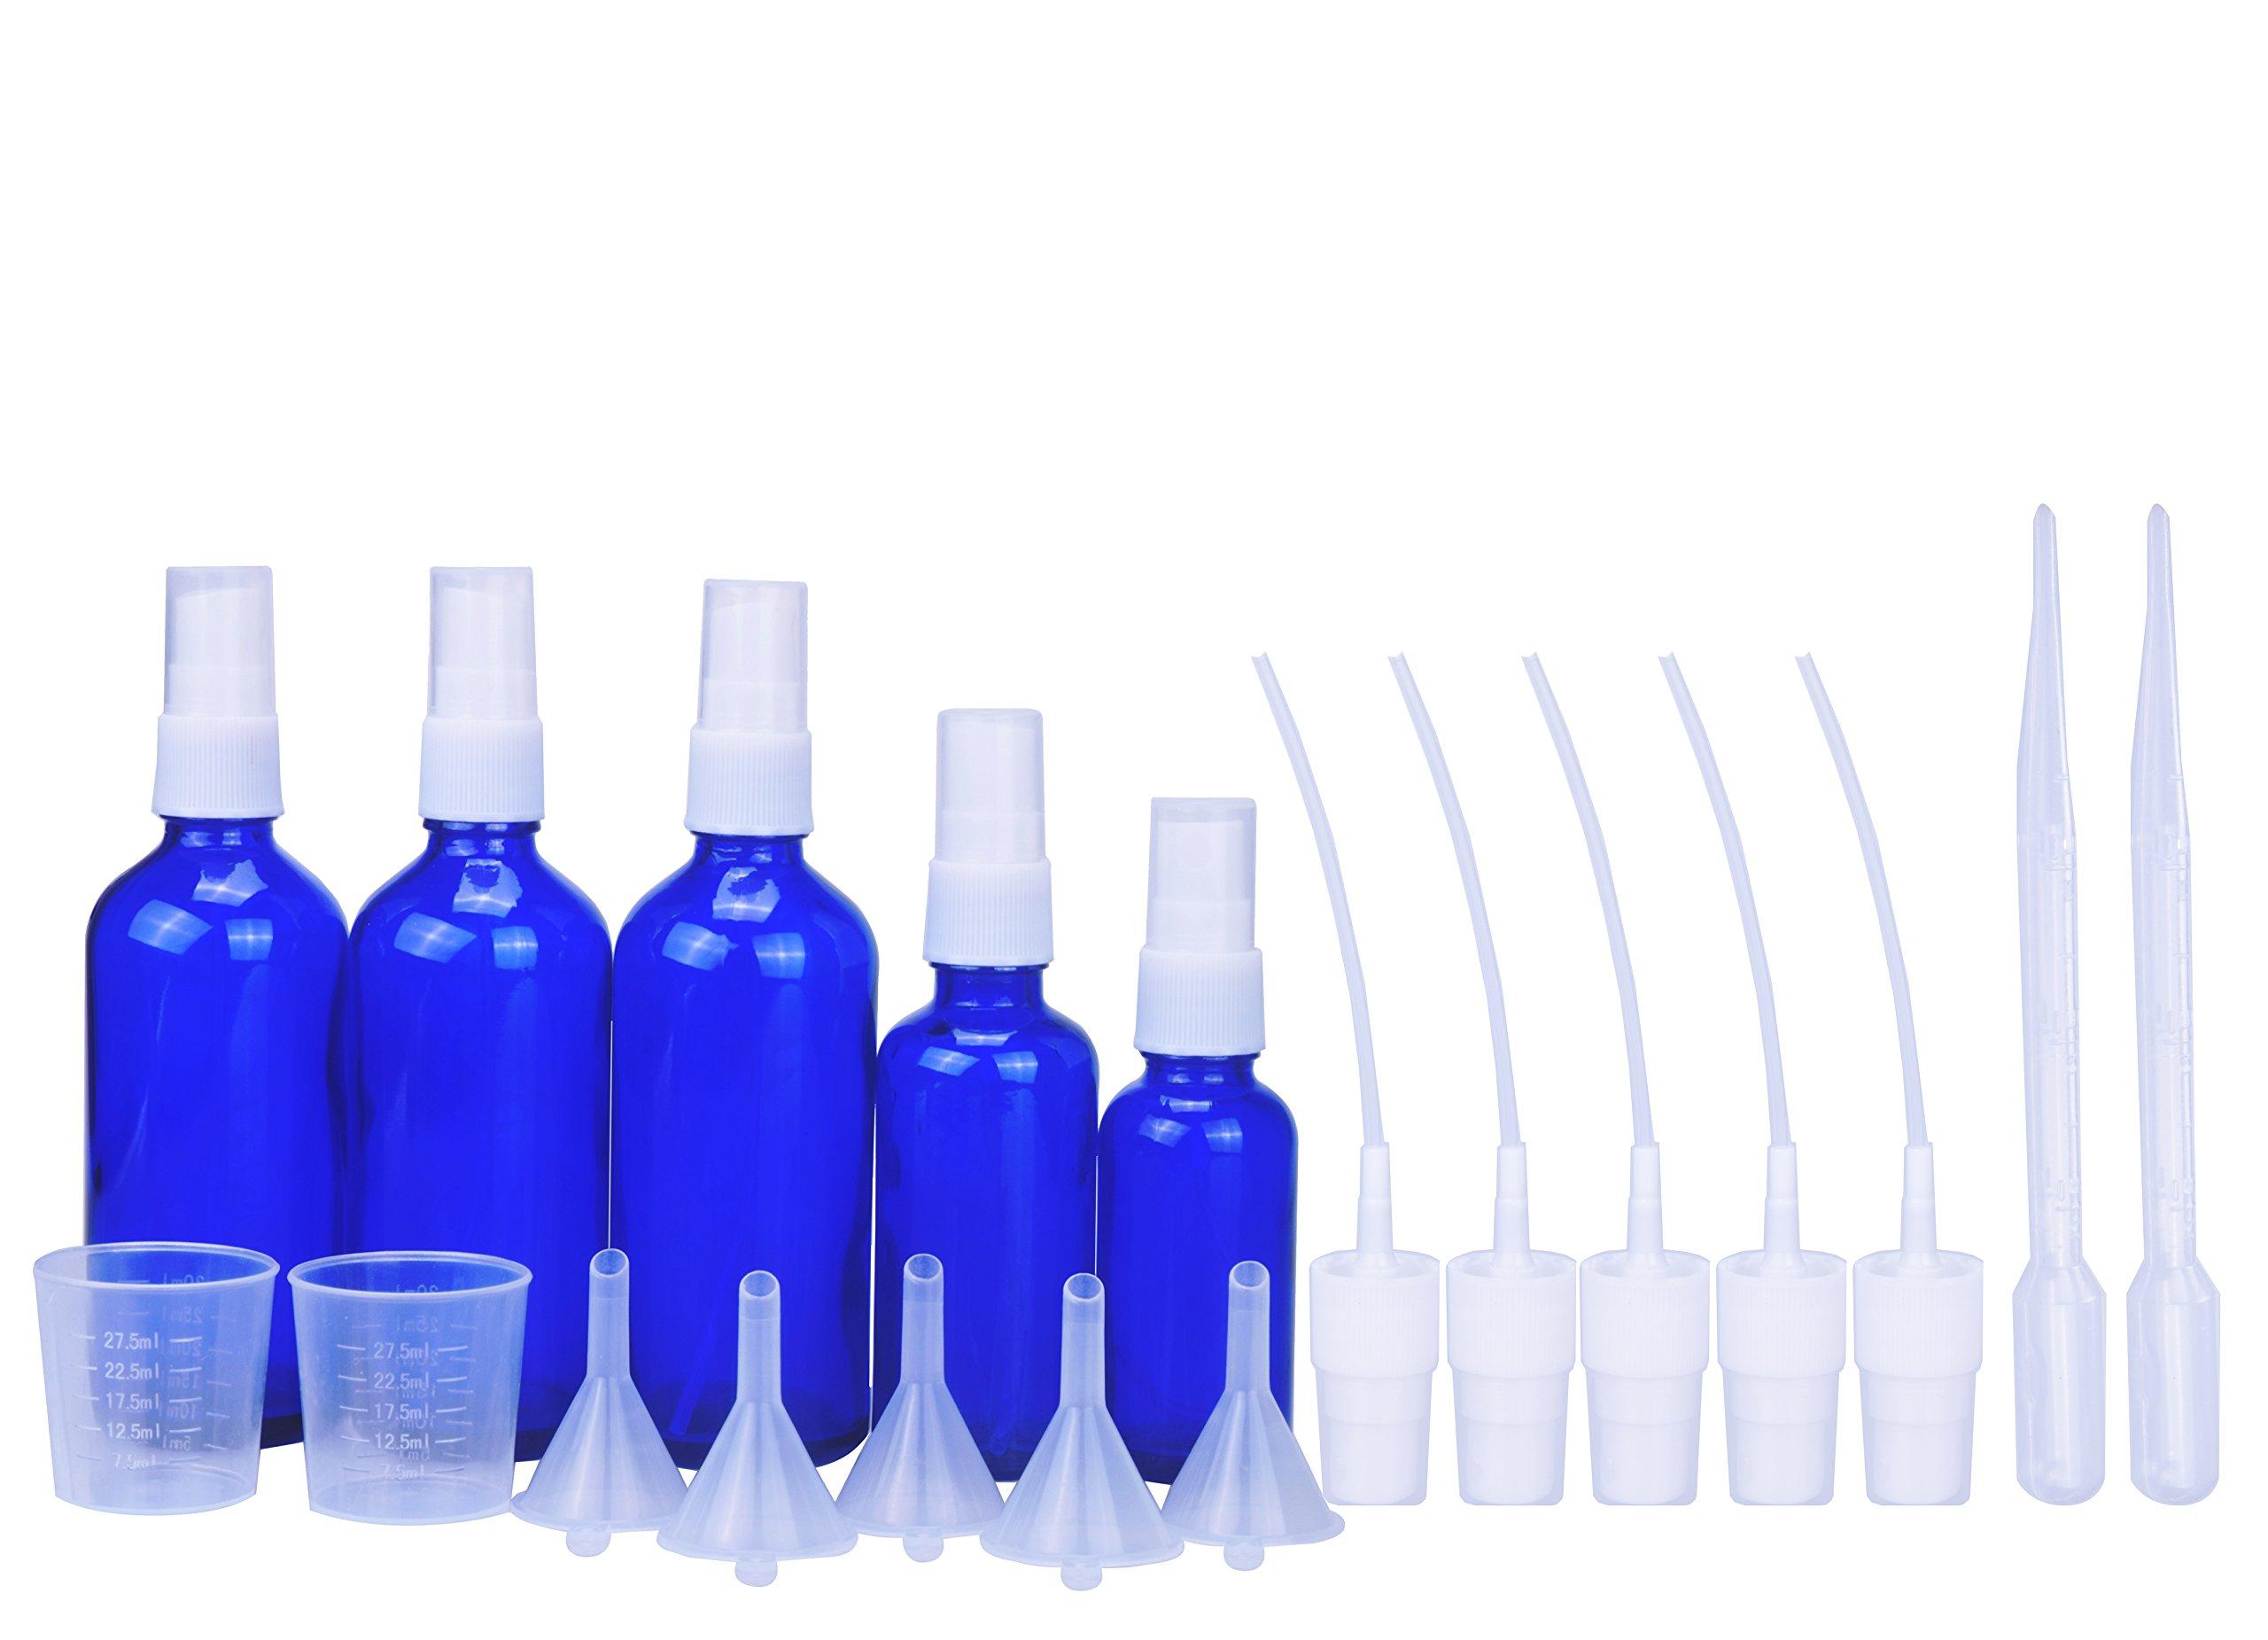 e698e2a264df Cheap 4 Oz Clear Glass Bottles, find 4 Oz Clear Glass Bottles deals ...